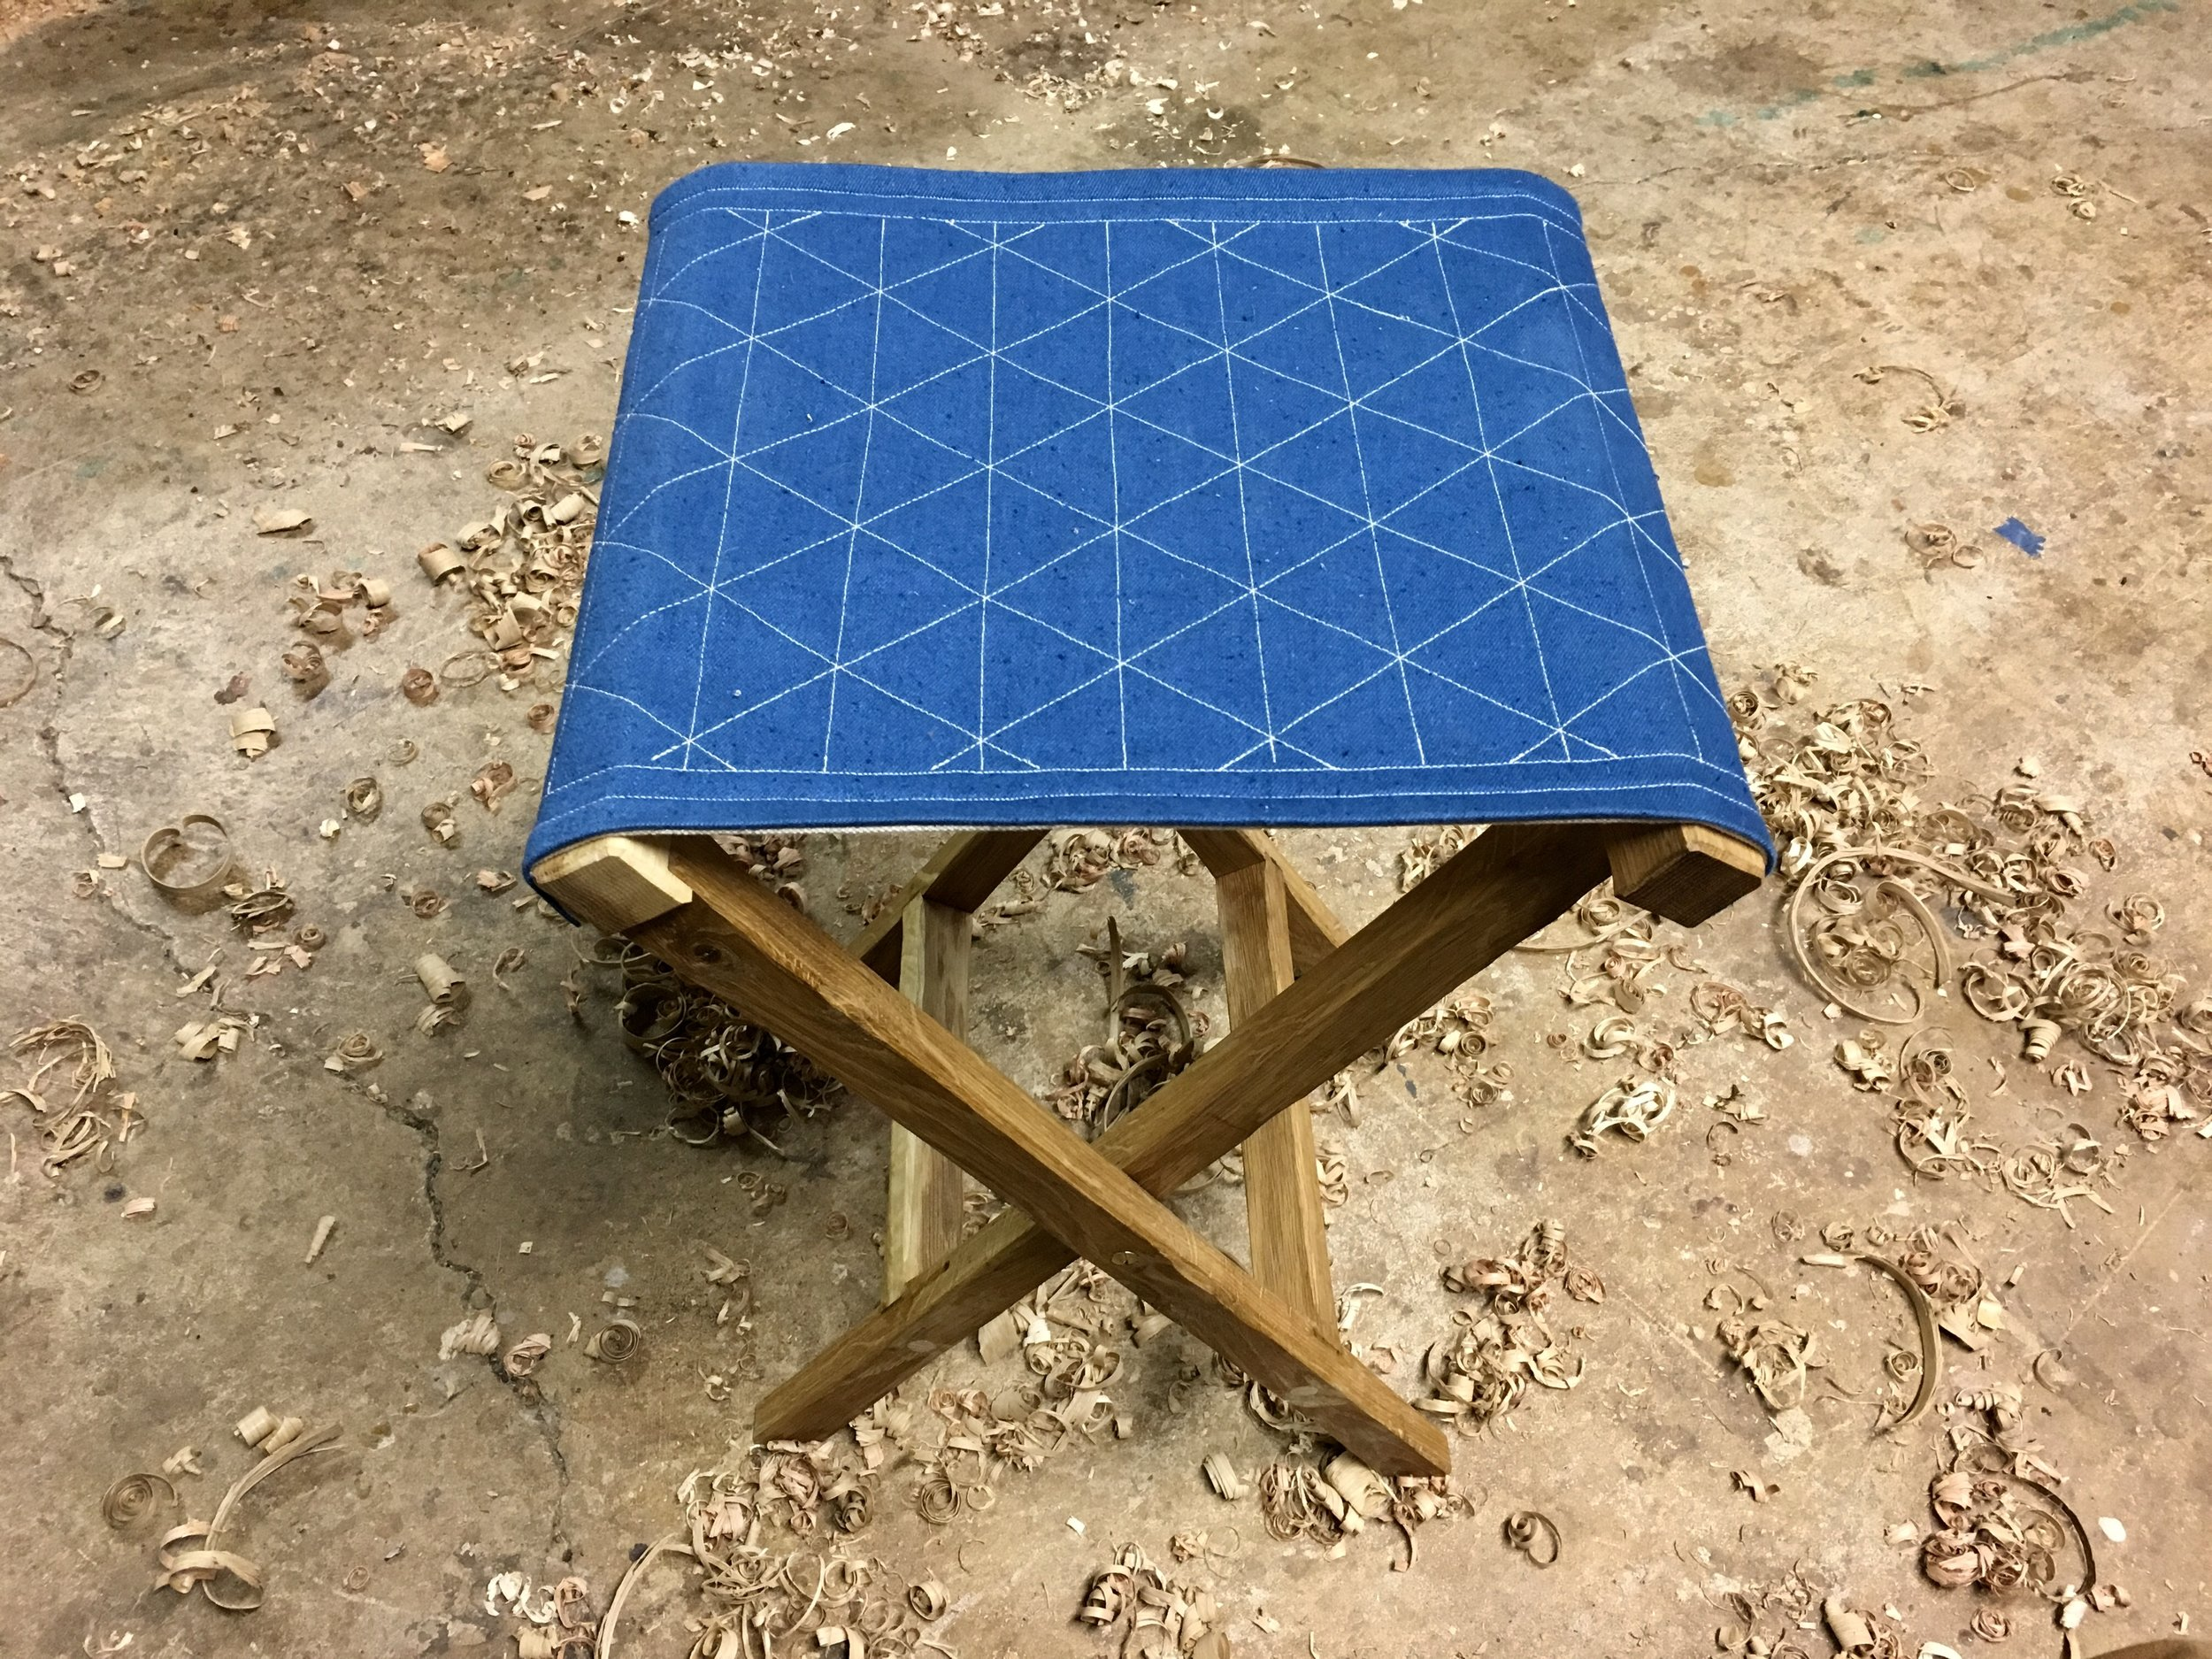 Folding camp stool made from Oregon White Oak, 2018.